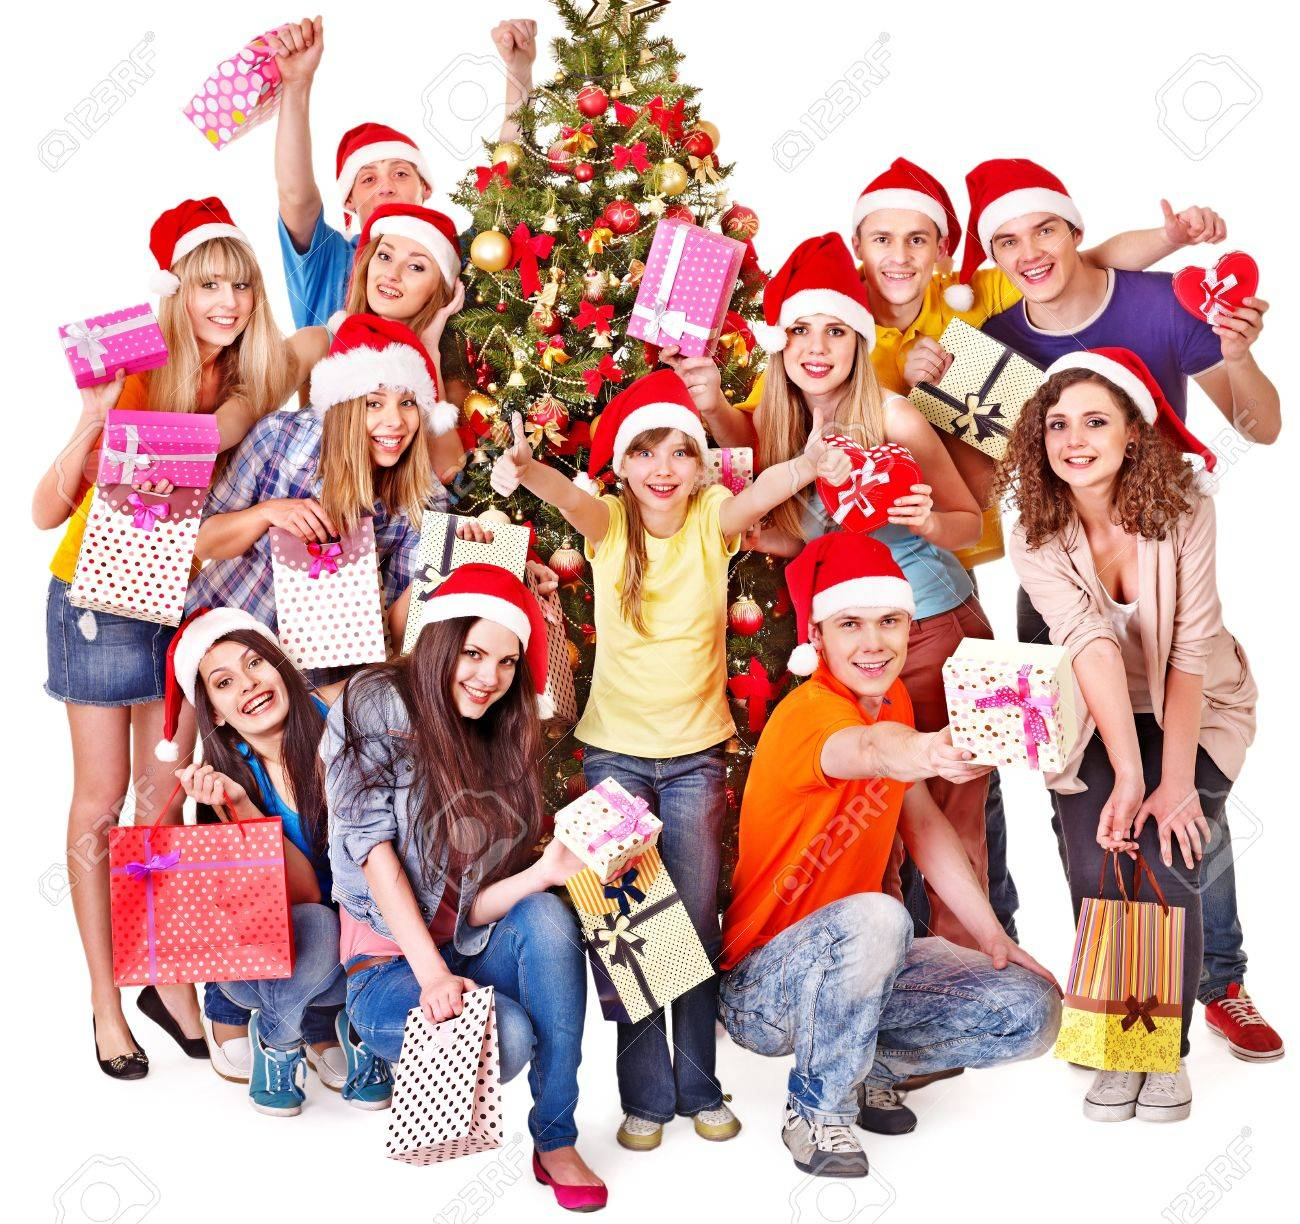 Group people and  Santa holding gift box near  Christmas tree. Stock Photo - 16610339